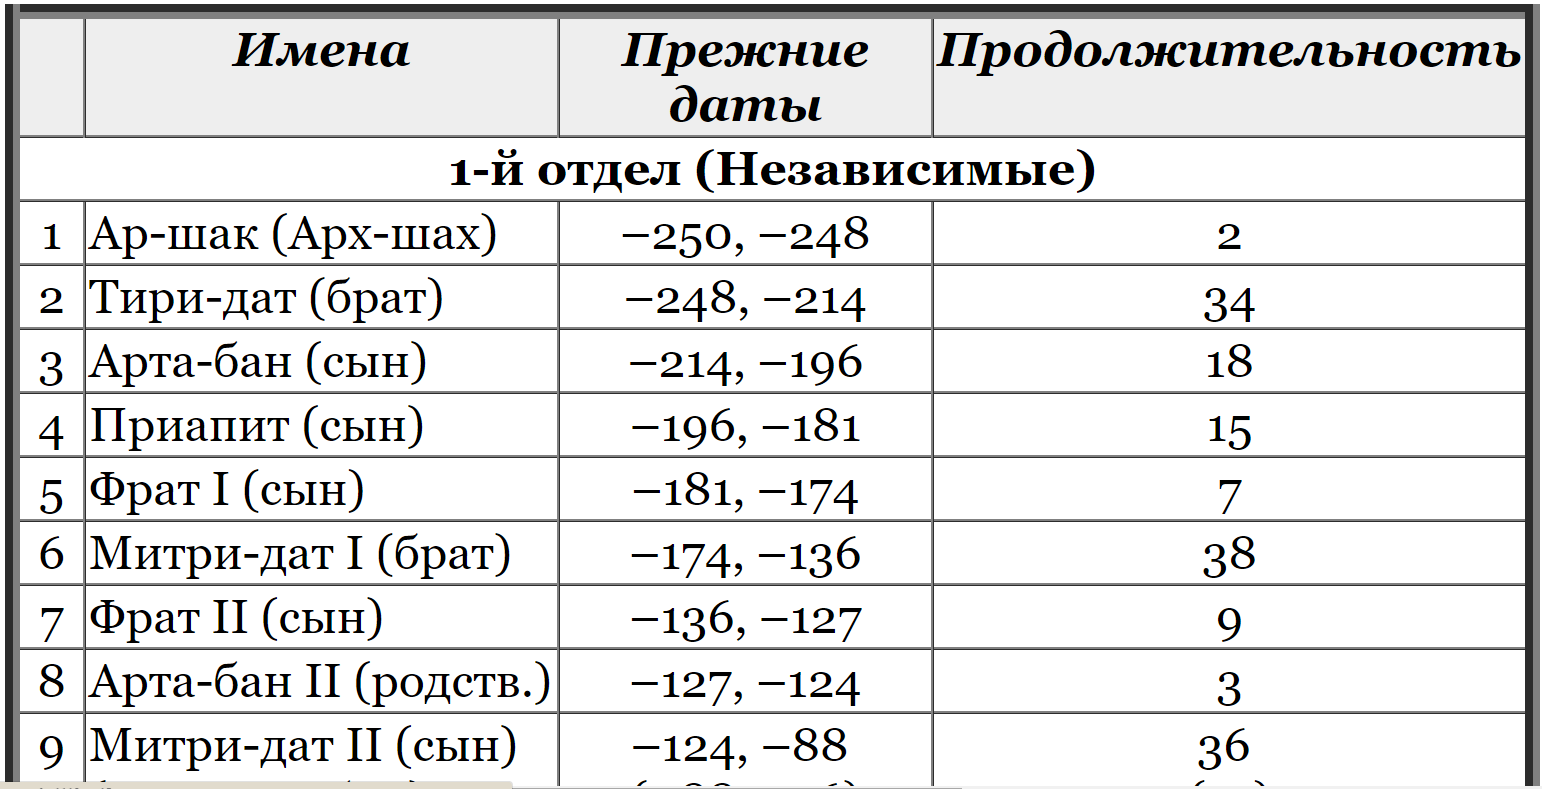 http://s2.uploads.ru/ejWXD.png